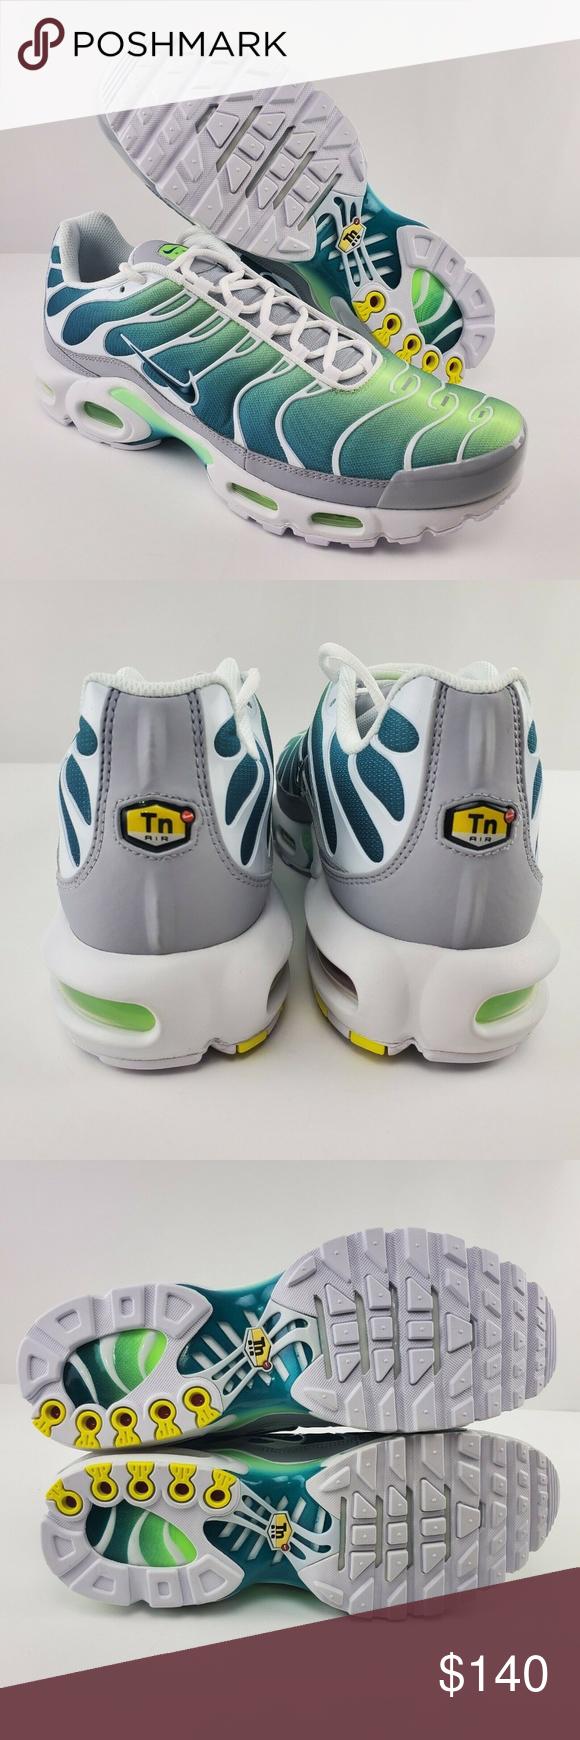 Nike Air Max Plus OG Tuned TN Mint